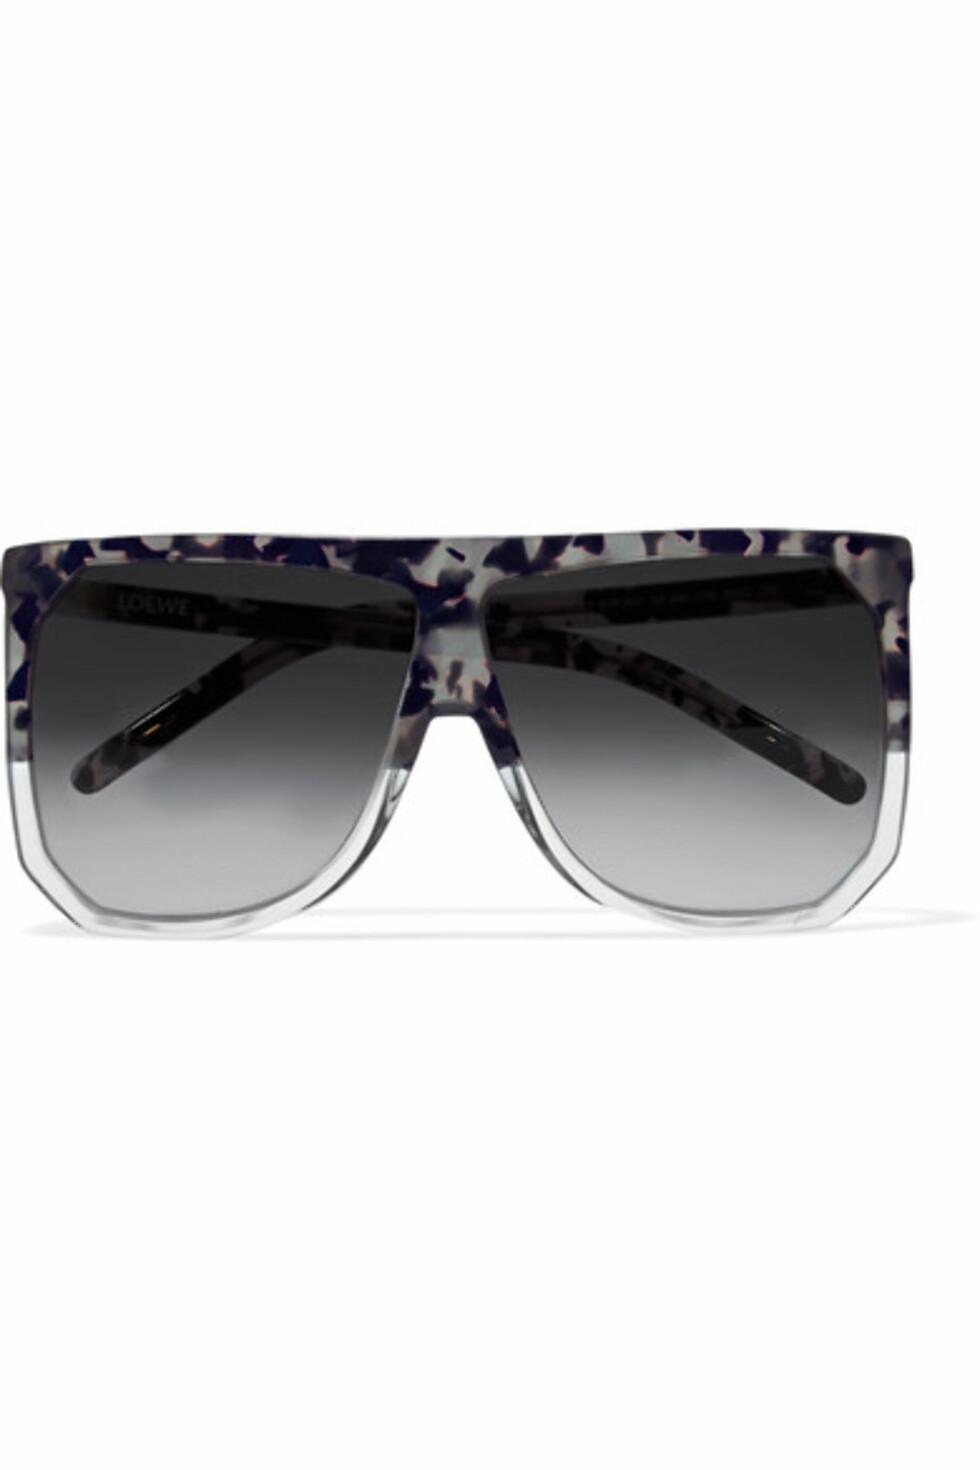 Solbriller fra Loewe via Net-a-porter.com   kr 3190   https://www.net-a-porter.com/no/en/product/815225/loewe/filipa-d-frame-acetate-sunglasses